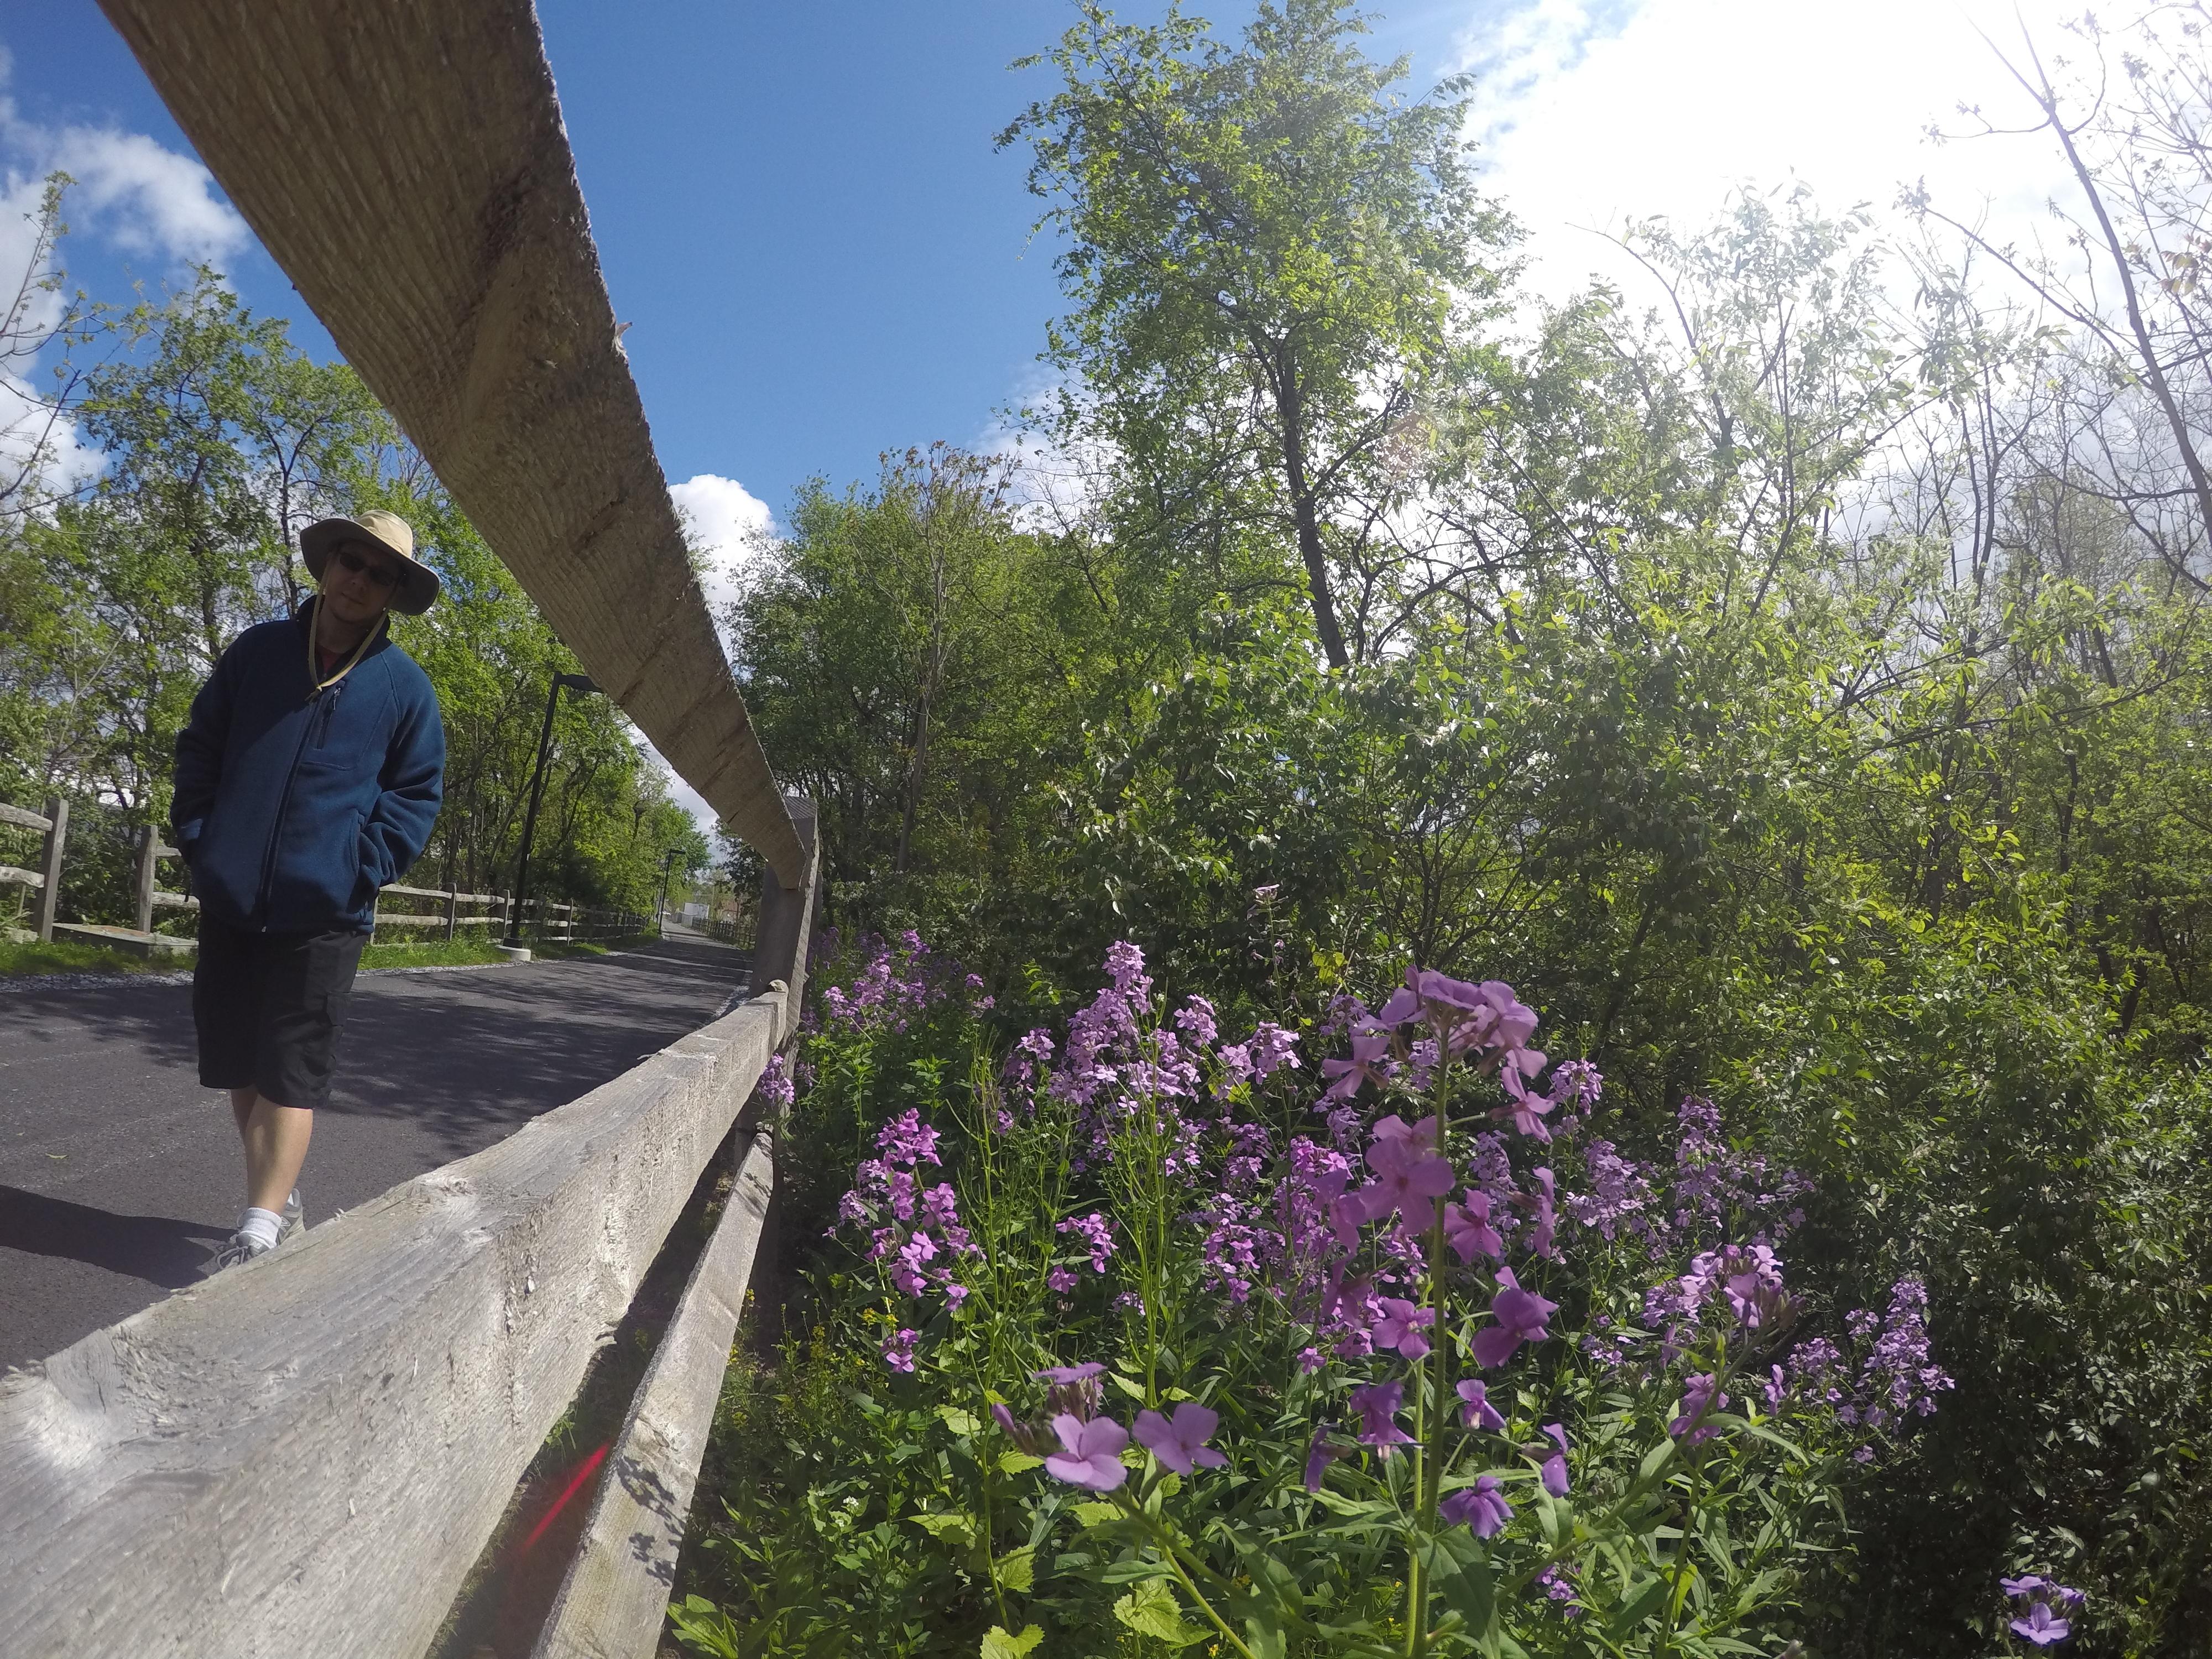 Fun view of the Akron Rail Trail